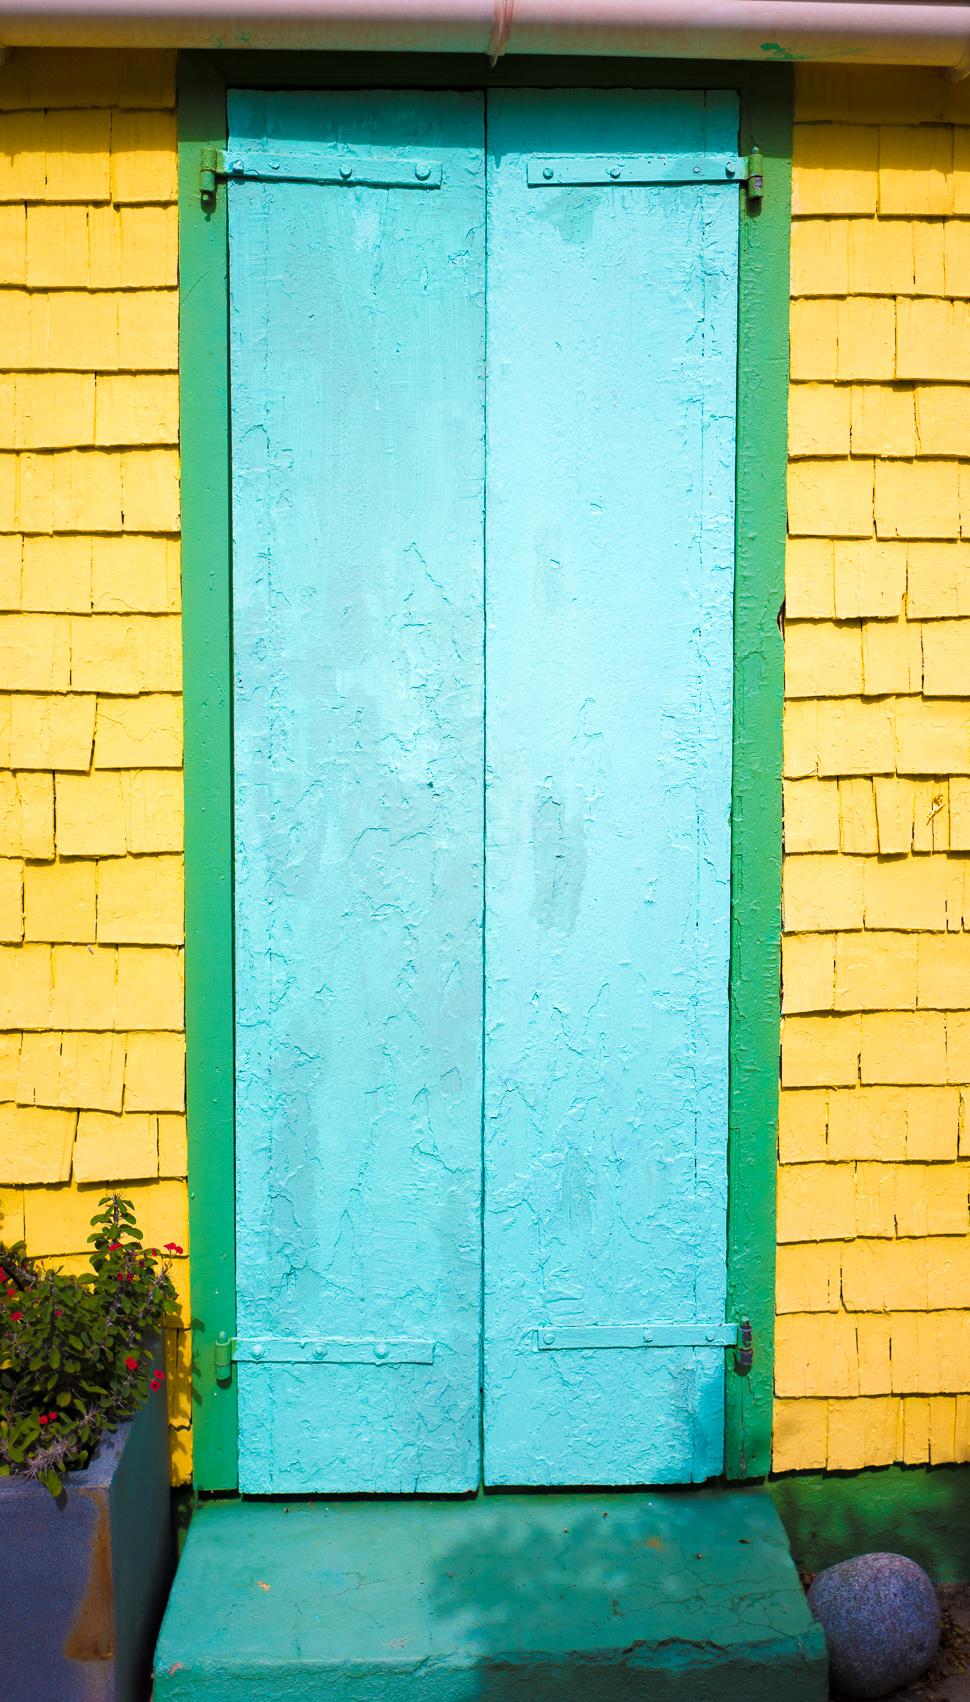 Case particulière / Traditional dwelling Jan 2016